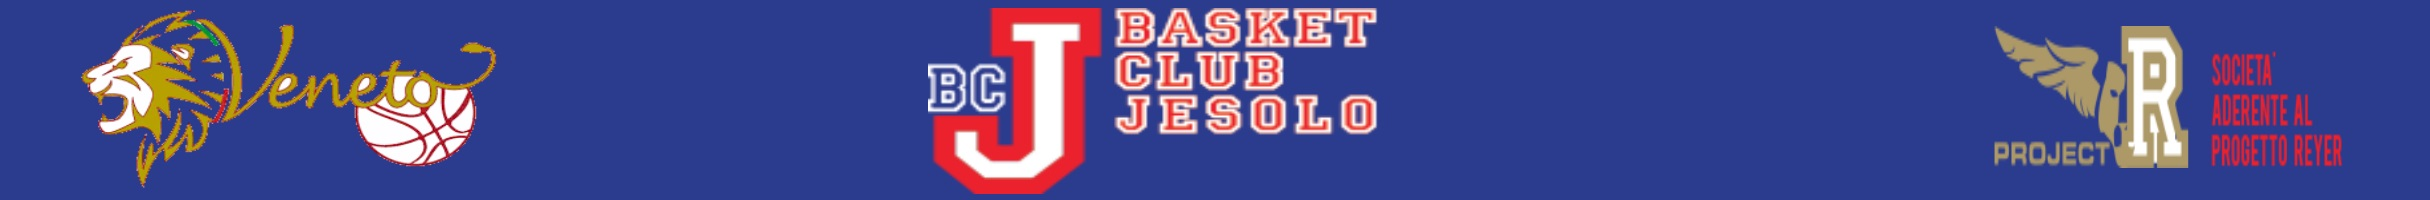 Secis BC Jesolo Logo